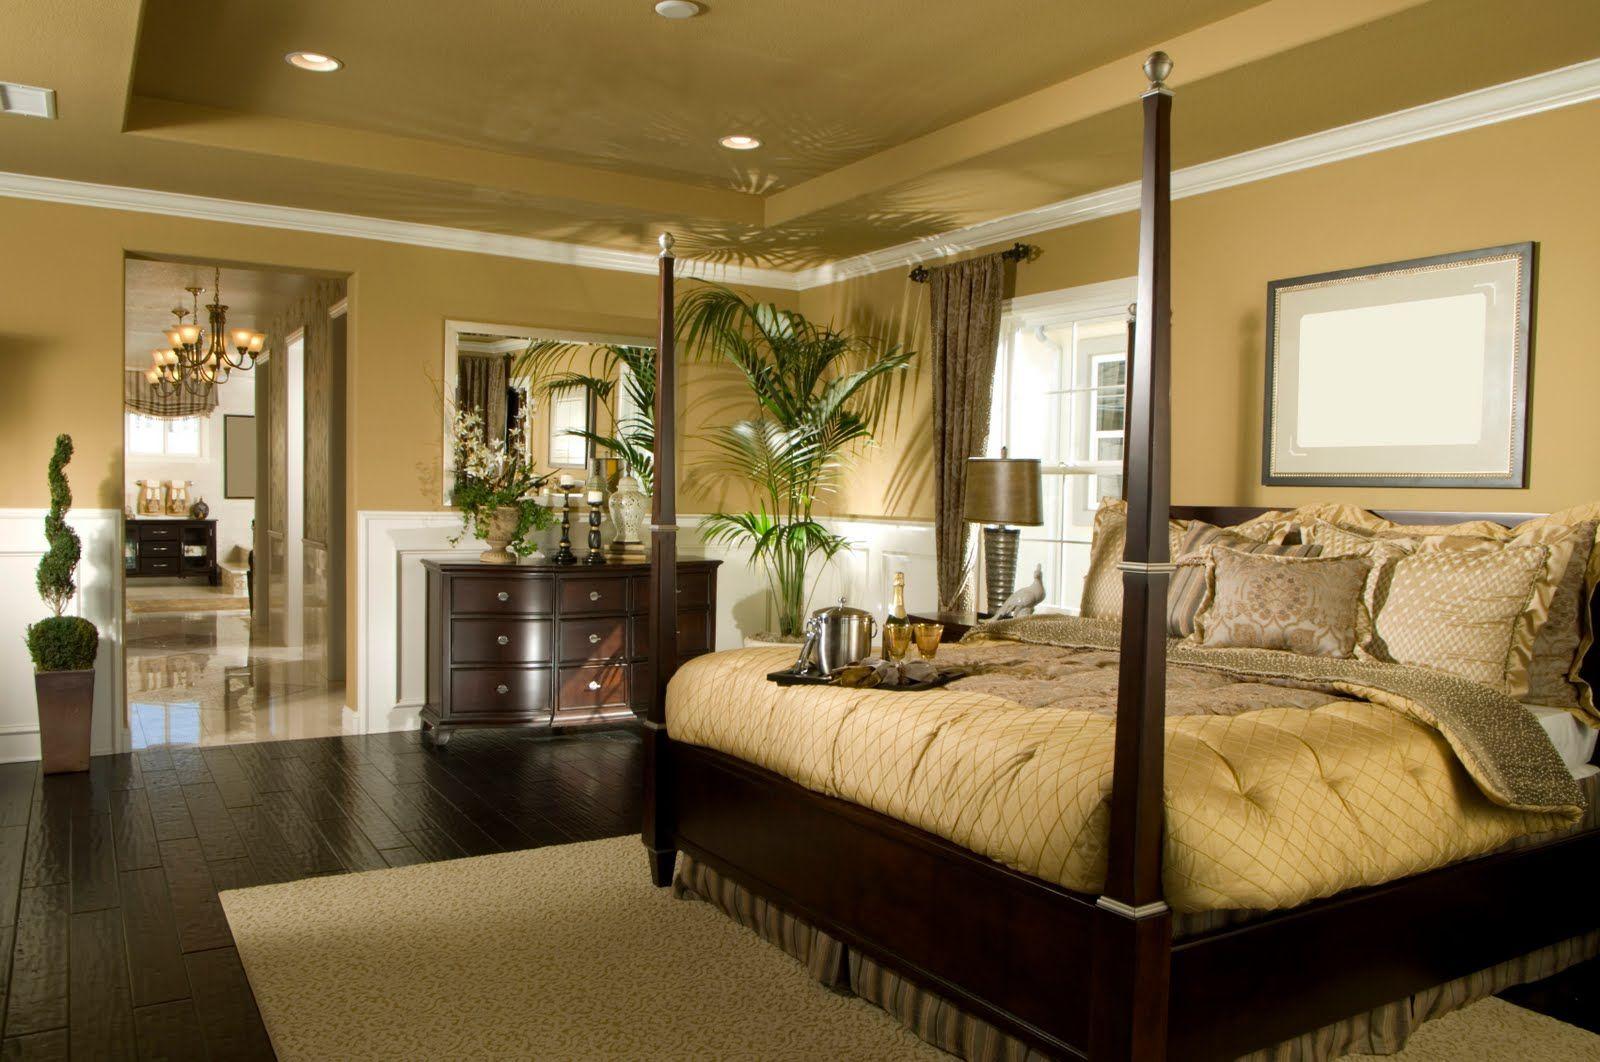 Million Dollar Homes Centerville Luxury Property For